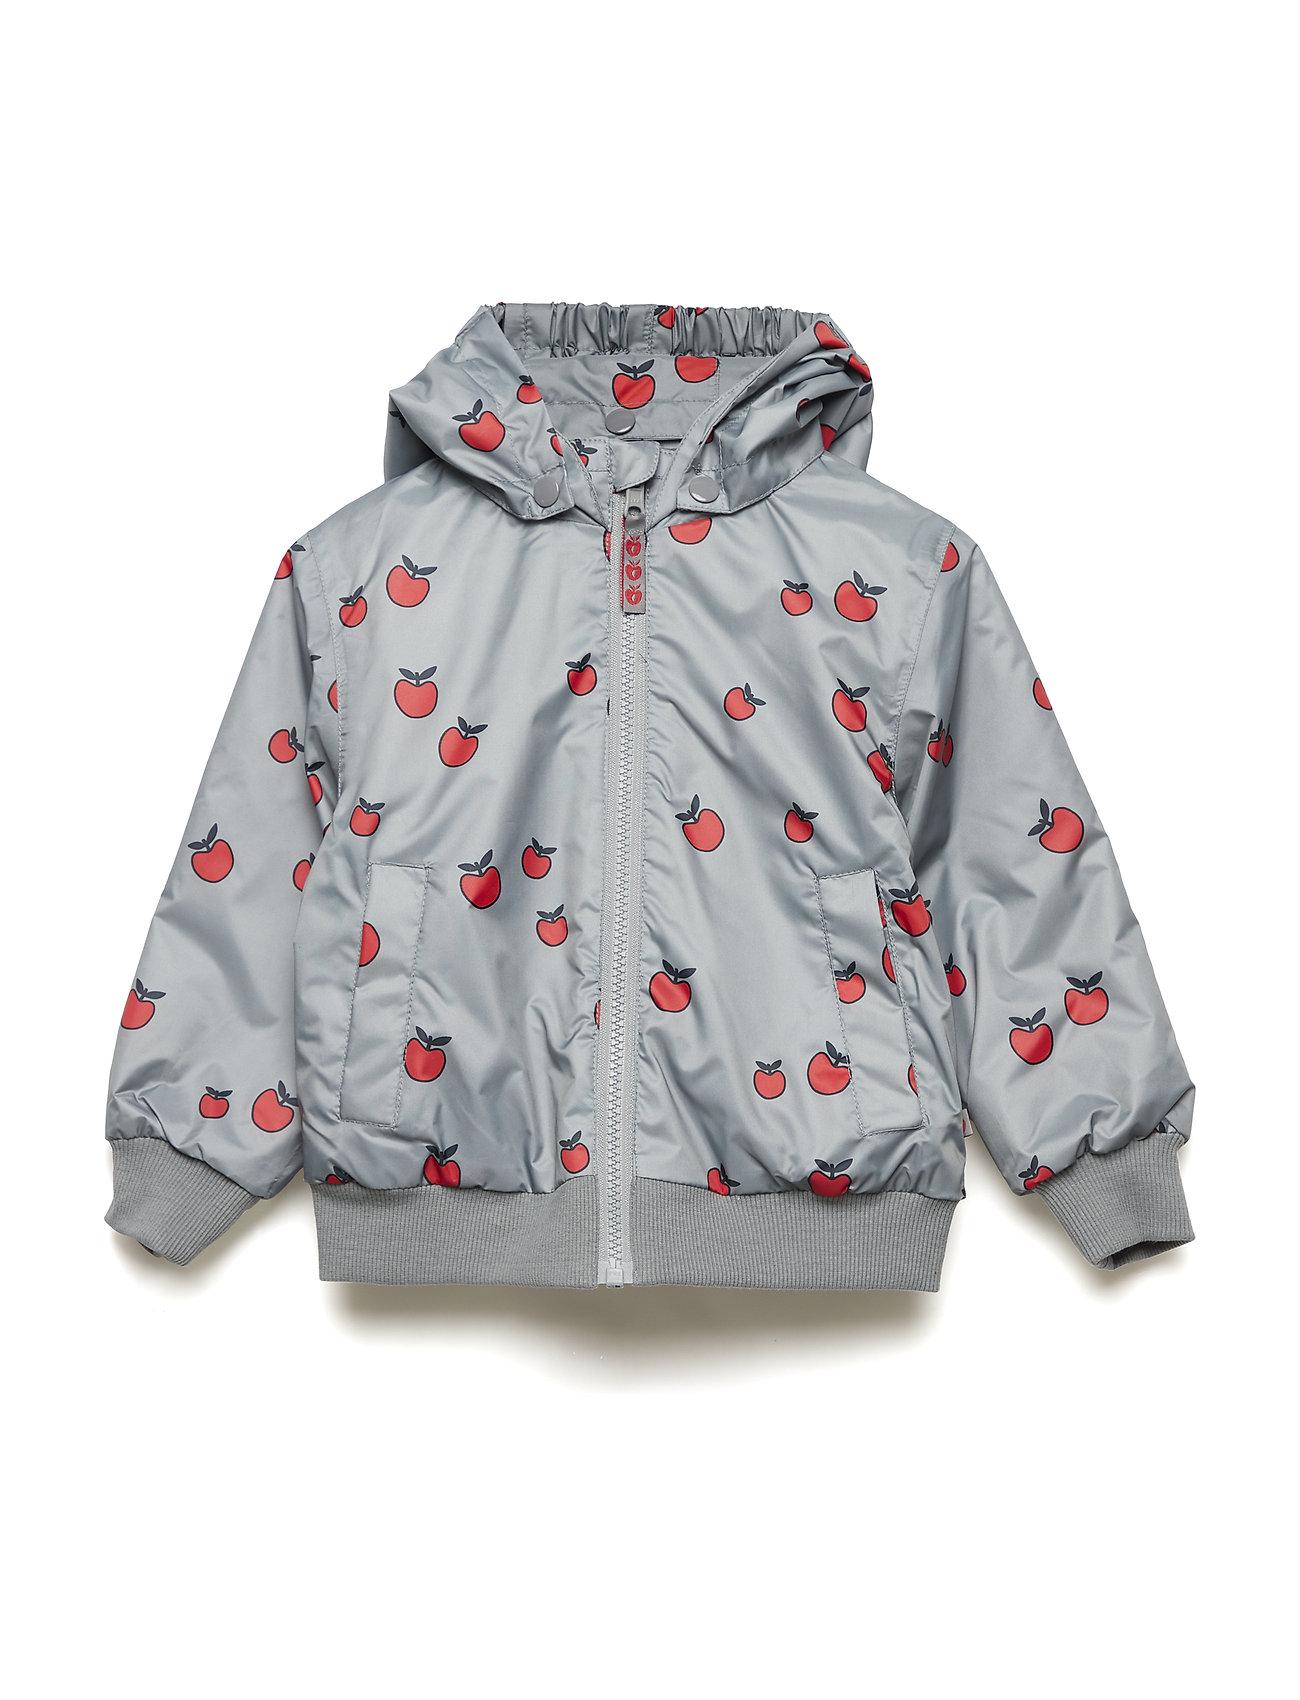 Småfolk Padded Turnable jacket. Apple - APPLE RED